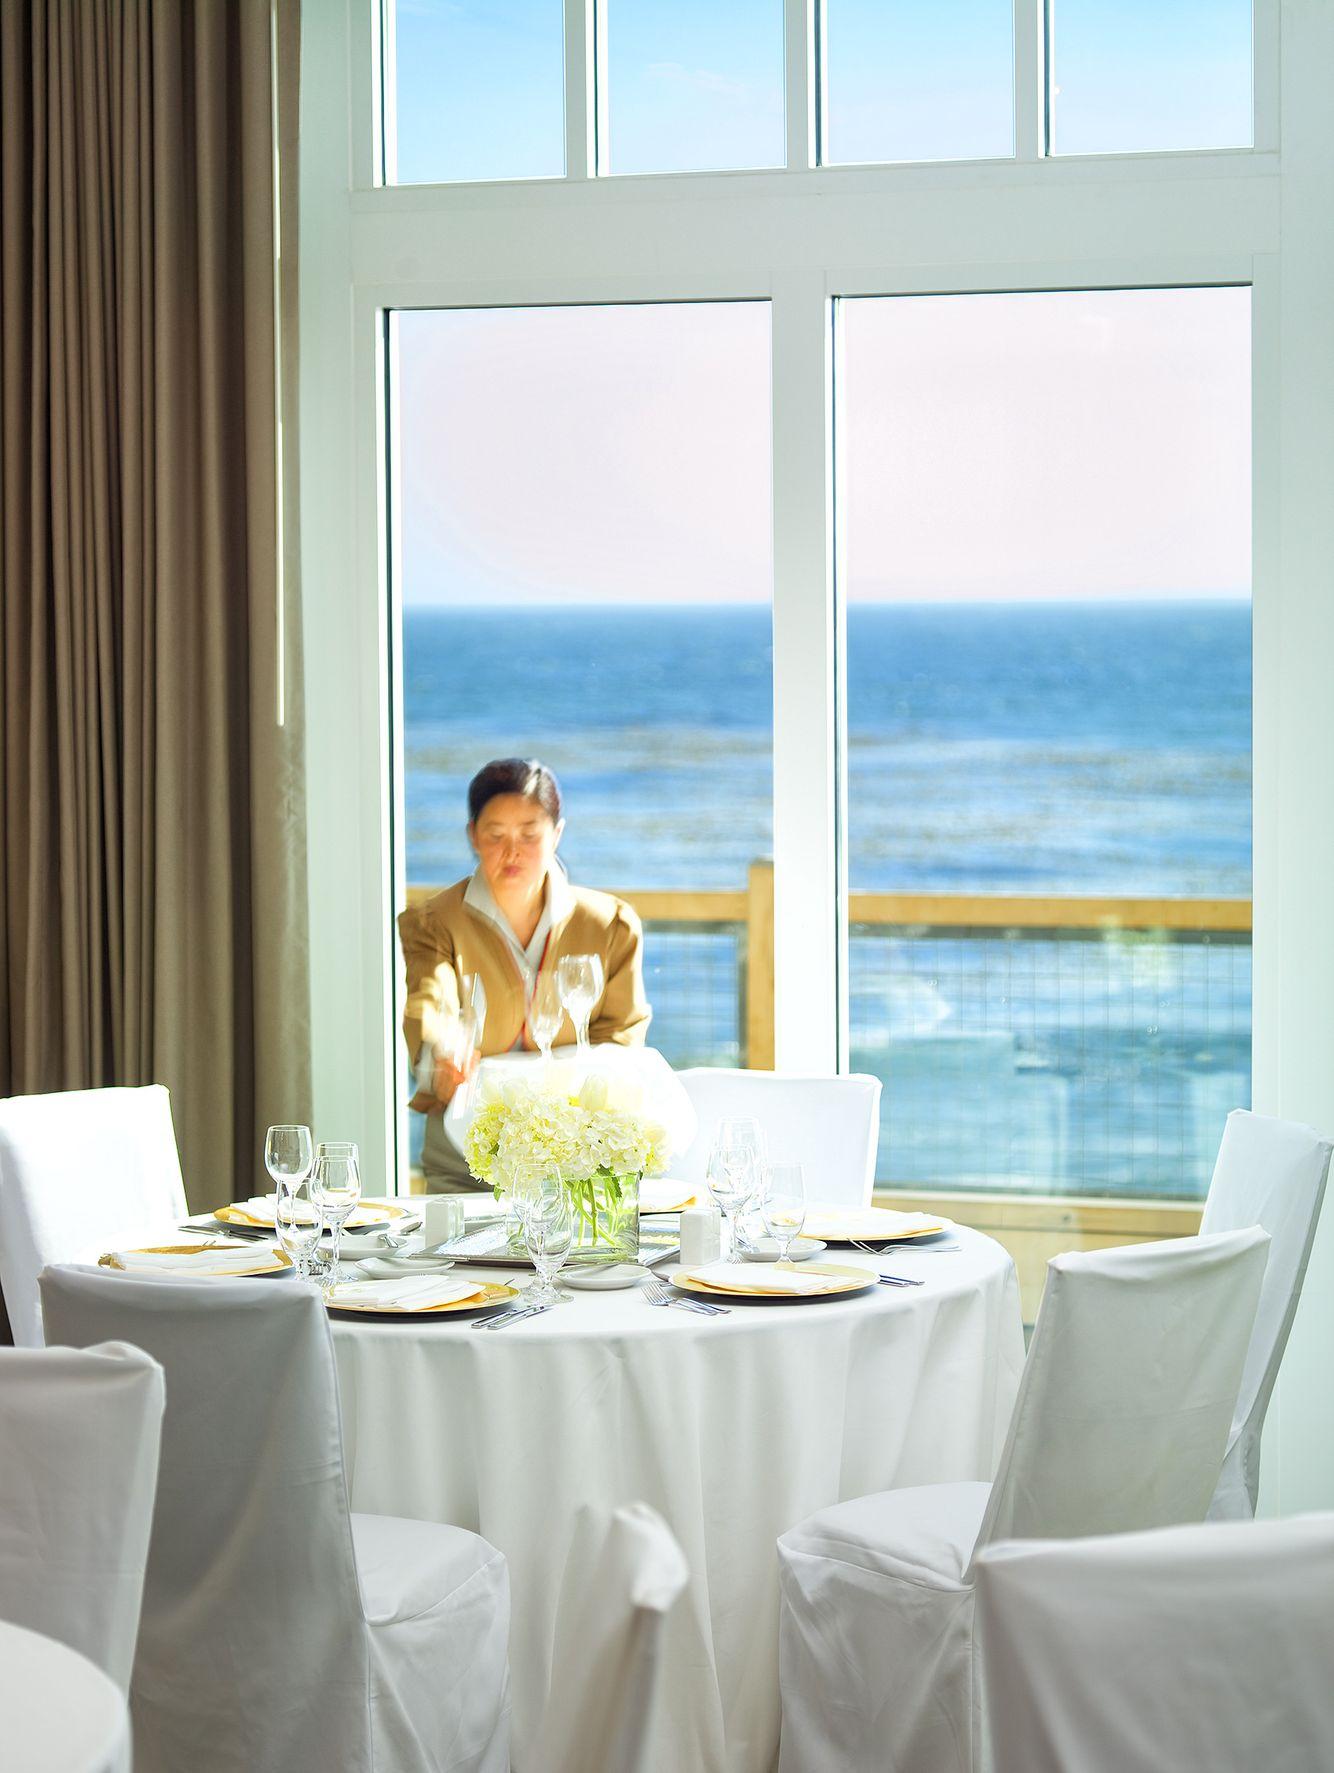 John-Sutton-Photography-InterContinental Hotel Monterey Bay Ballroom